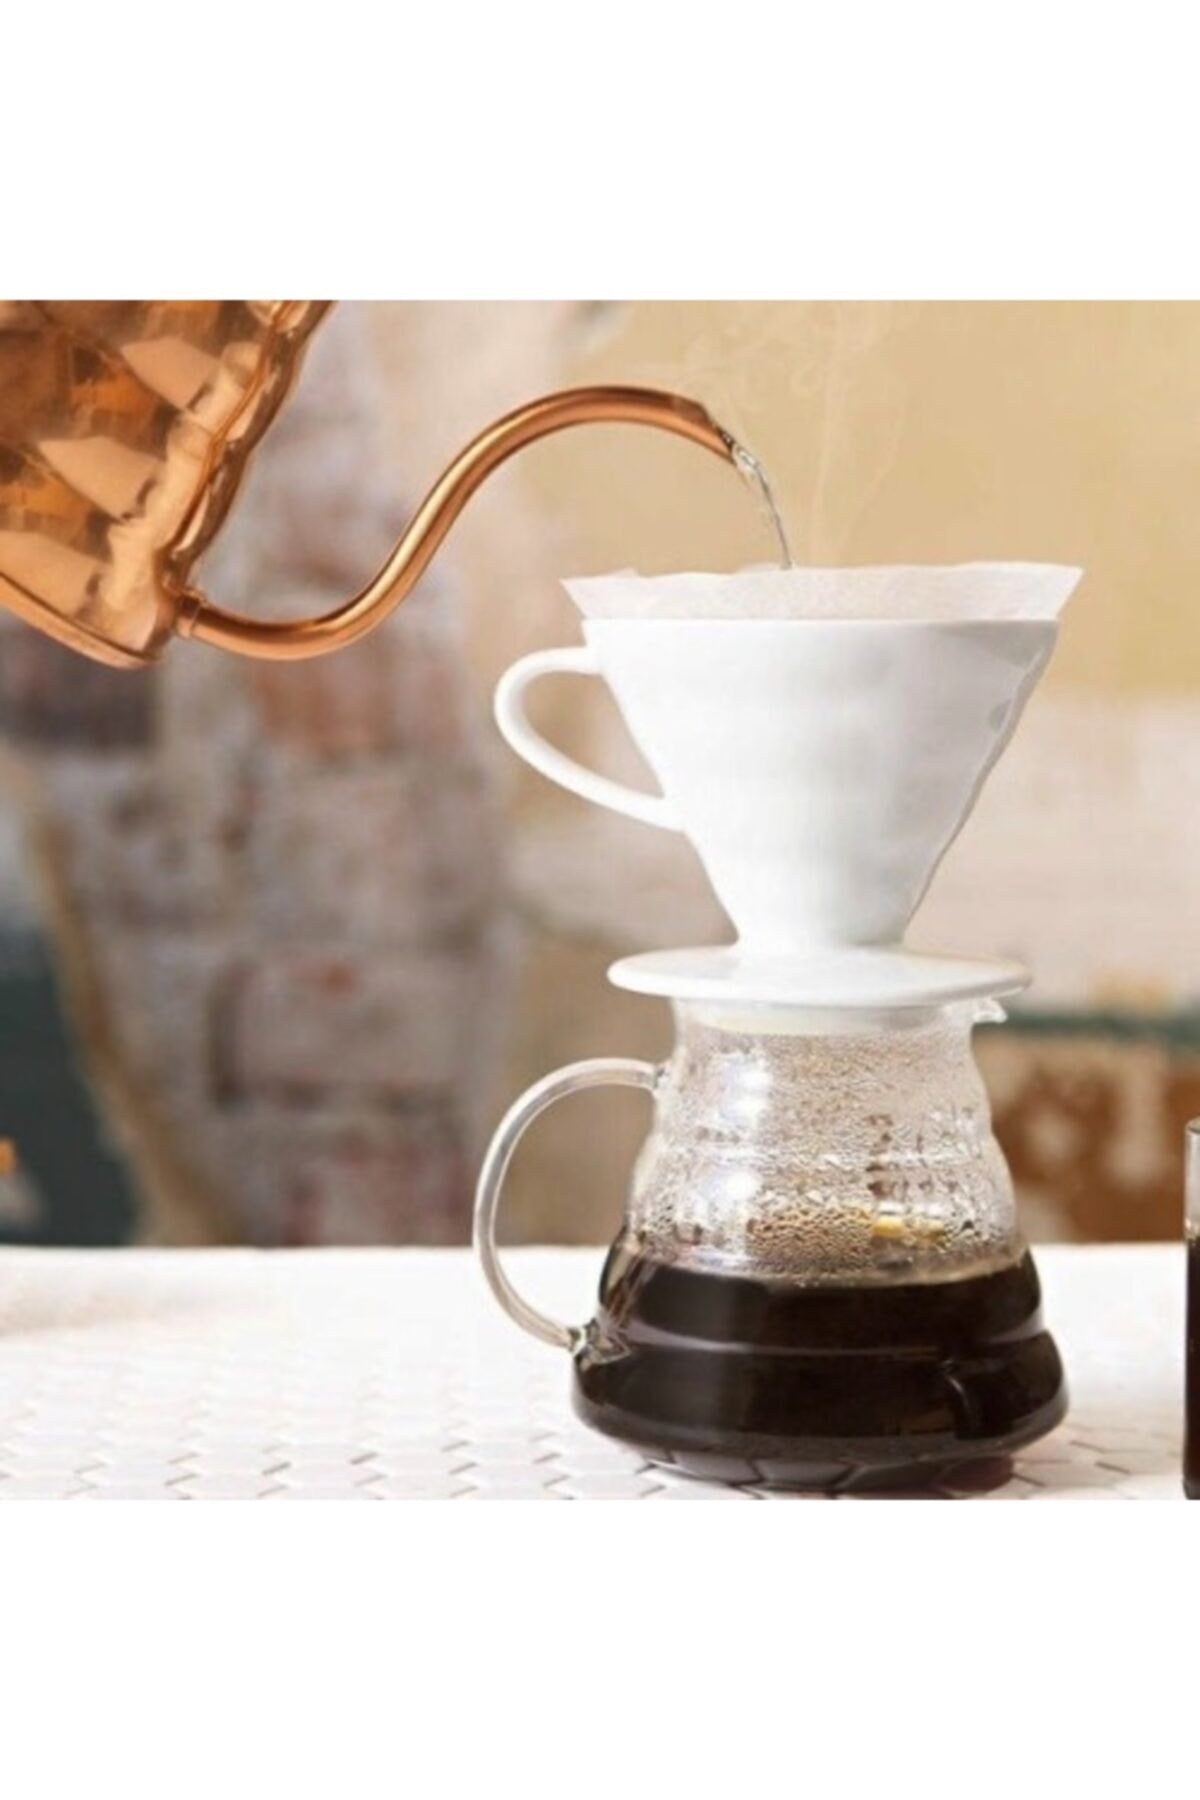 V60 Filtre Kahve Demleme Seti / Pour Over Dripper Set